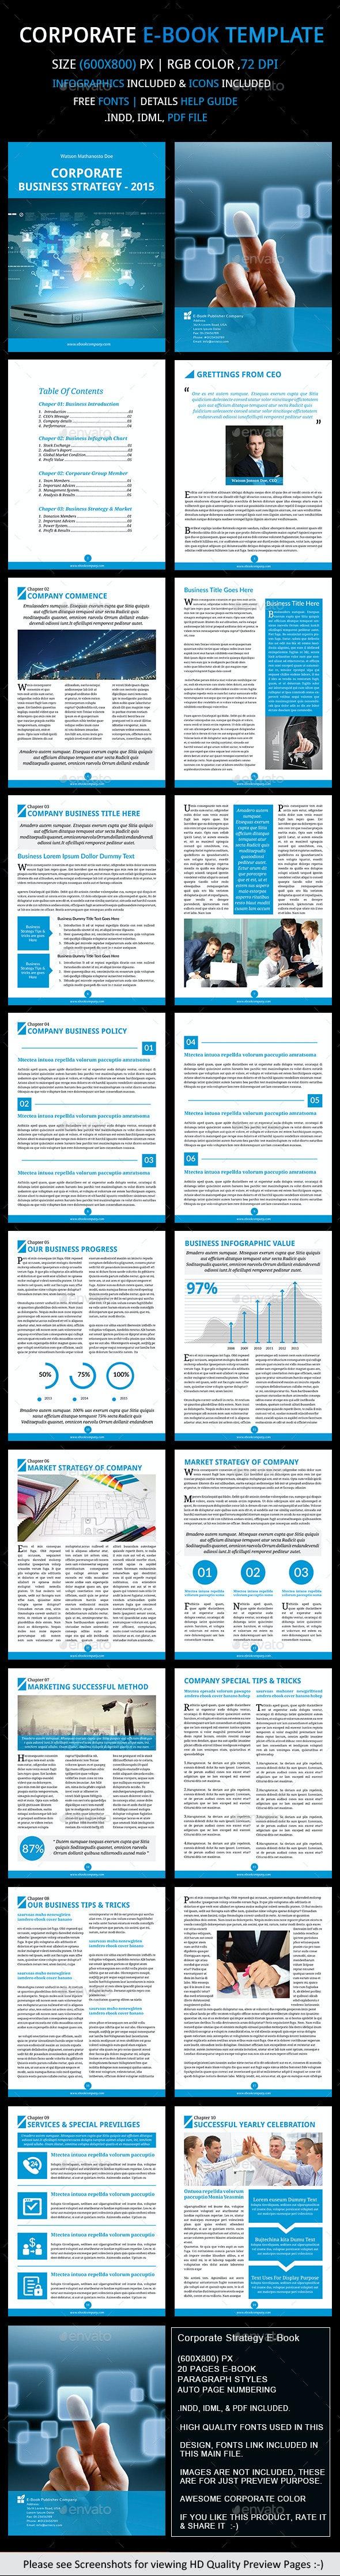 Corporate Strategy e(Book) Template - Digital Books ePublishing